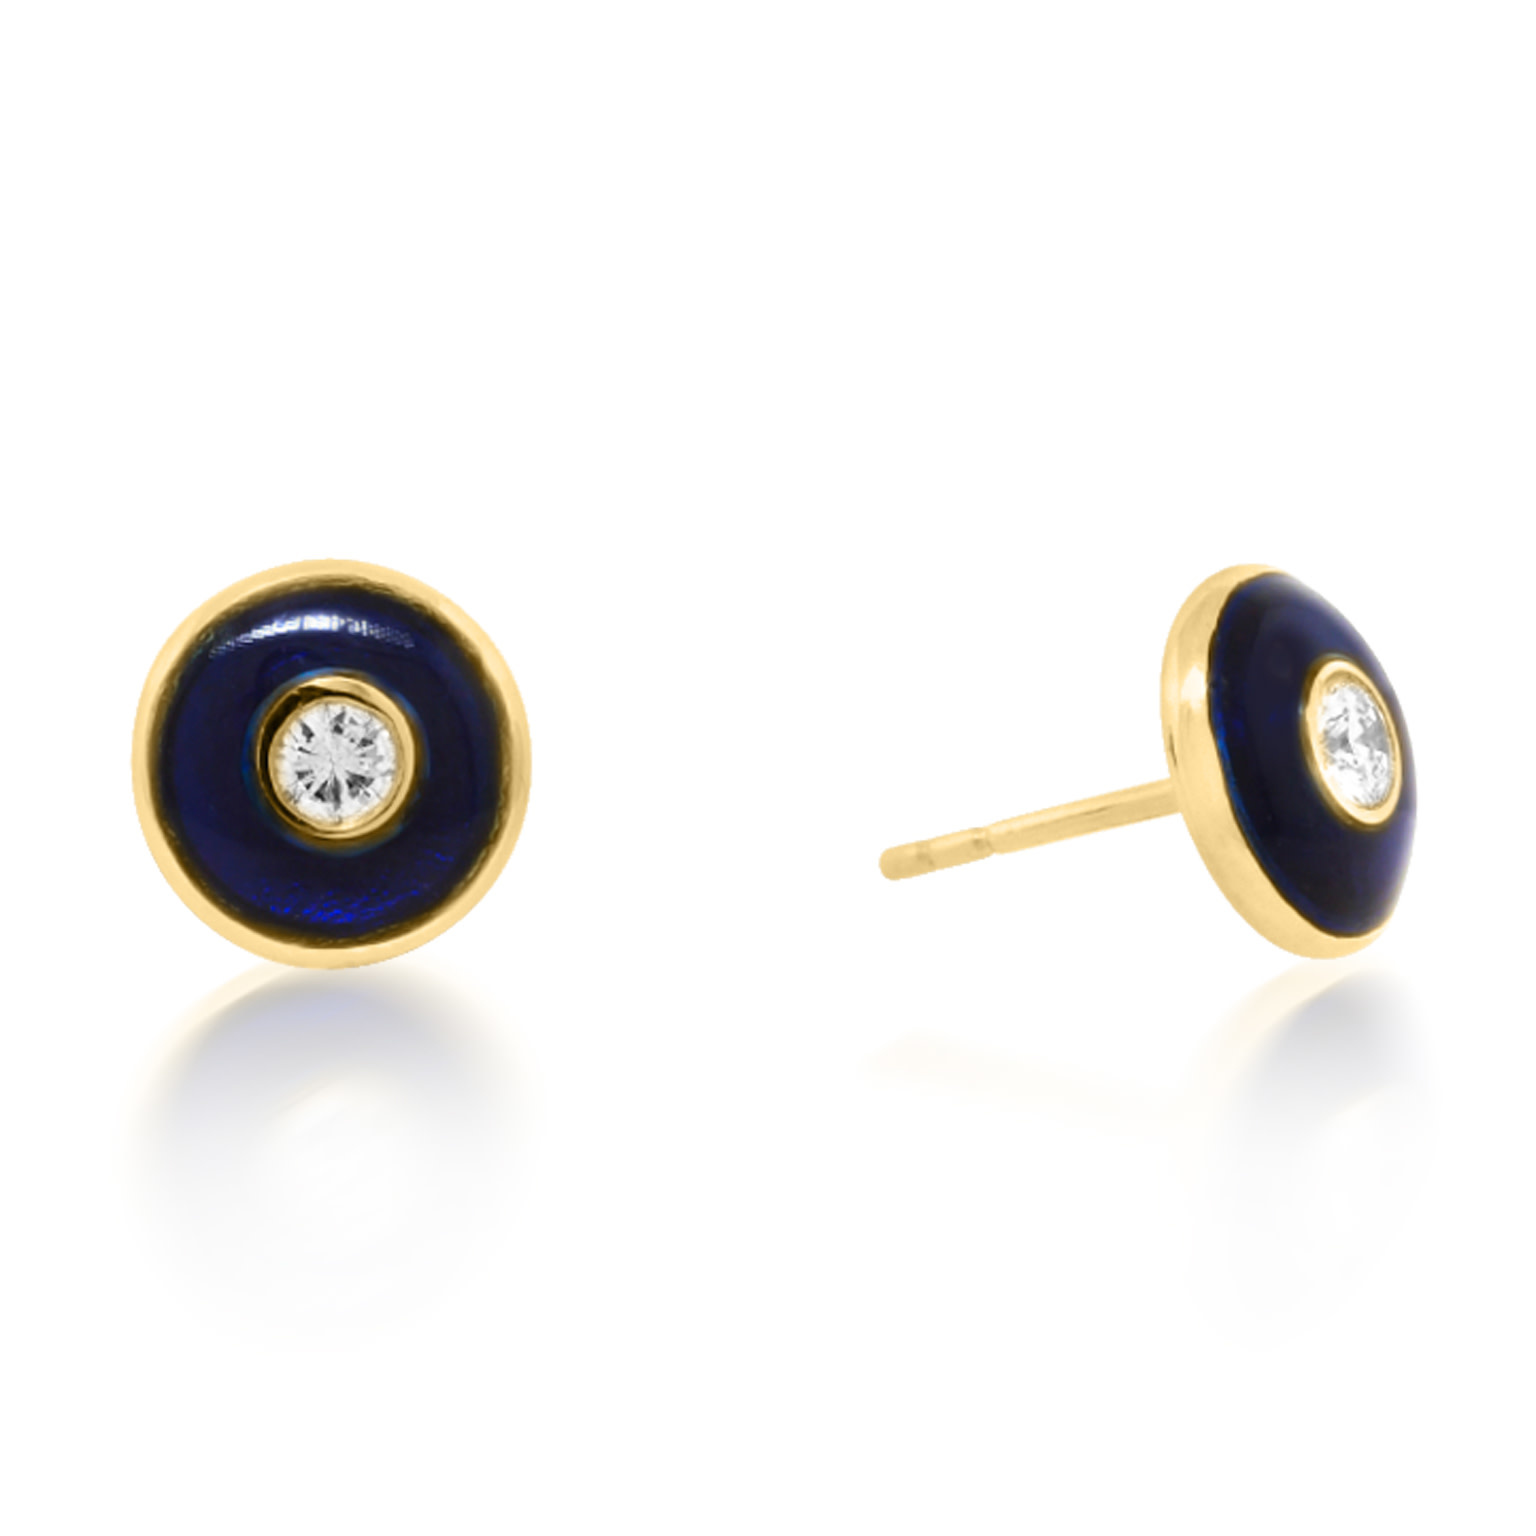 Trabert Goldsmiths Round Blue Enamel Diamond Stud Earrings